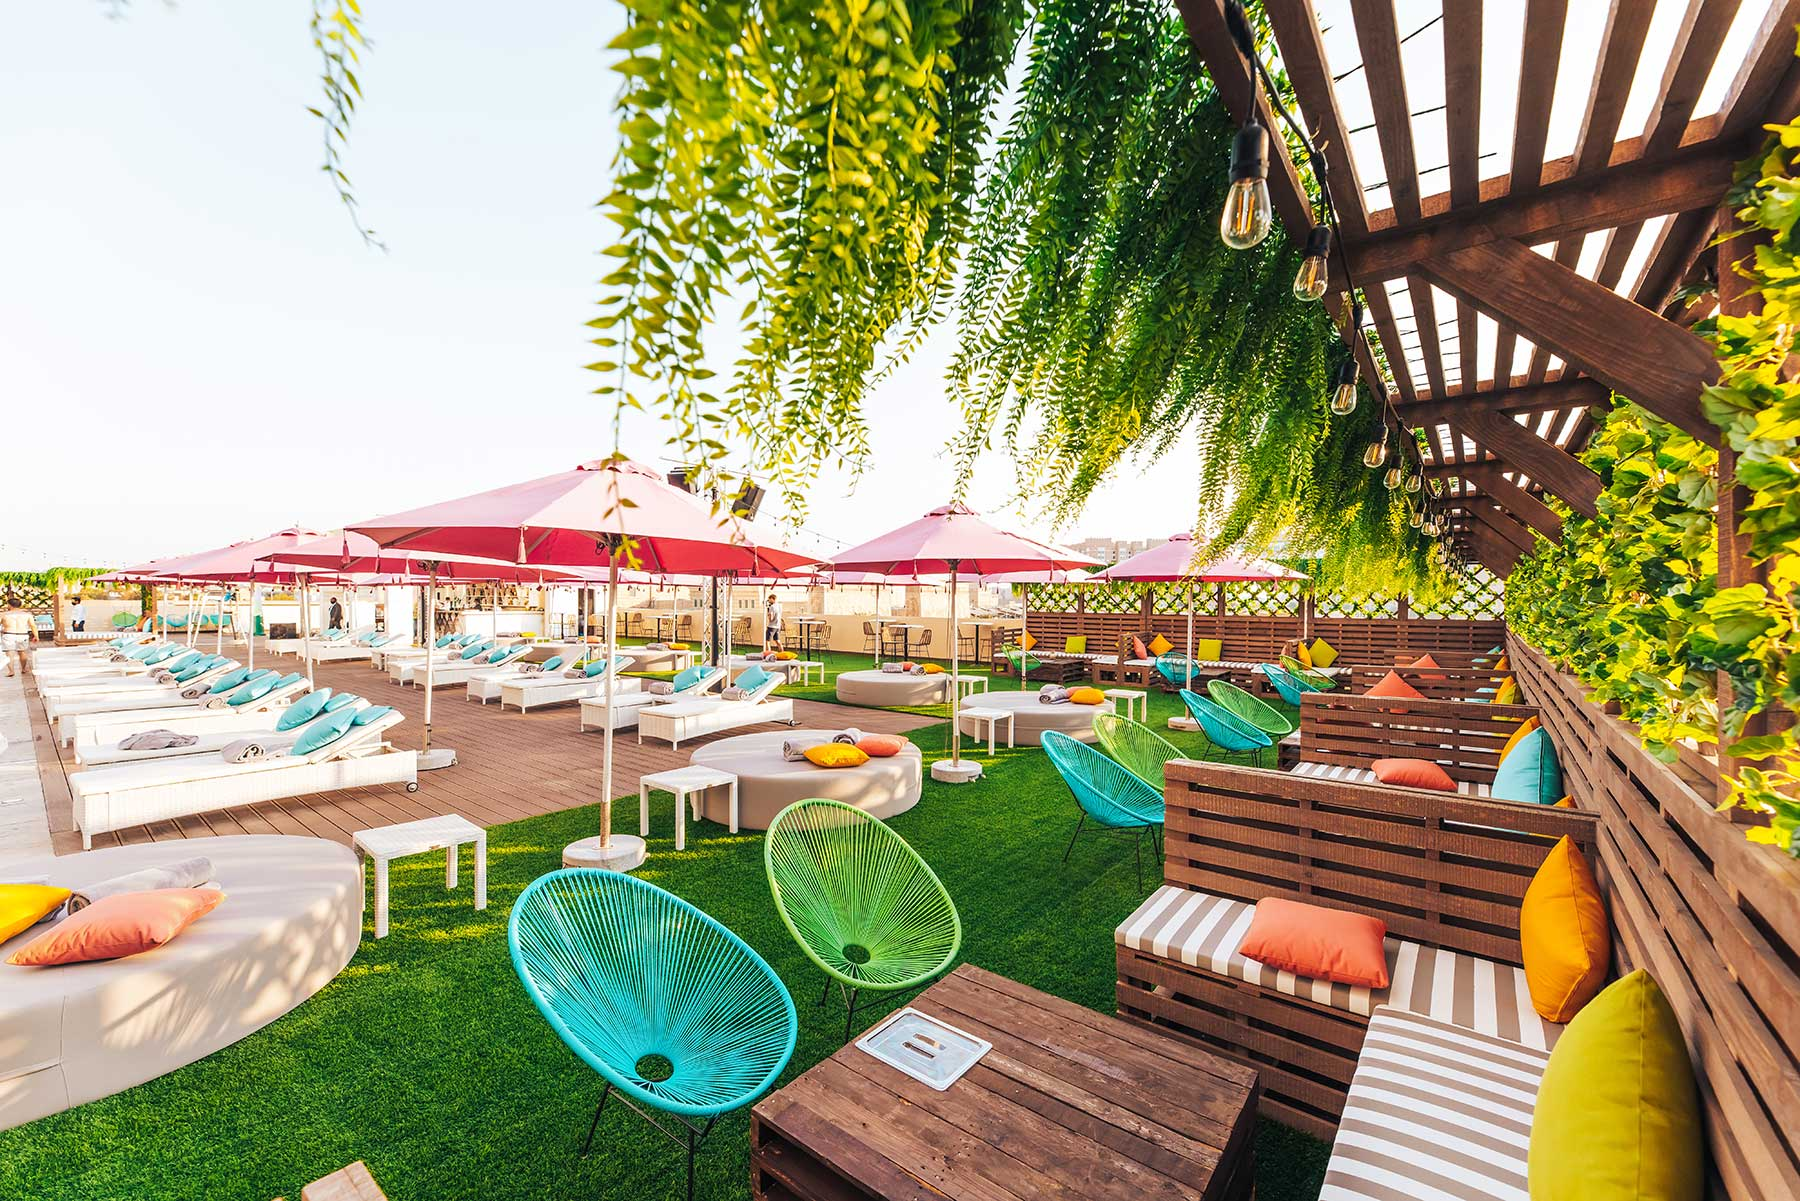 The new Missippi Pool Bar & Social Hub in Dubai